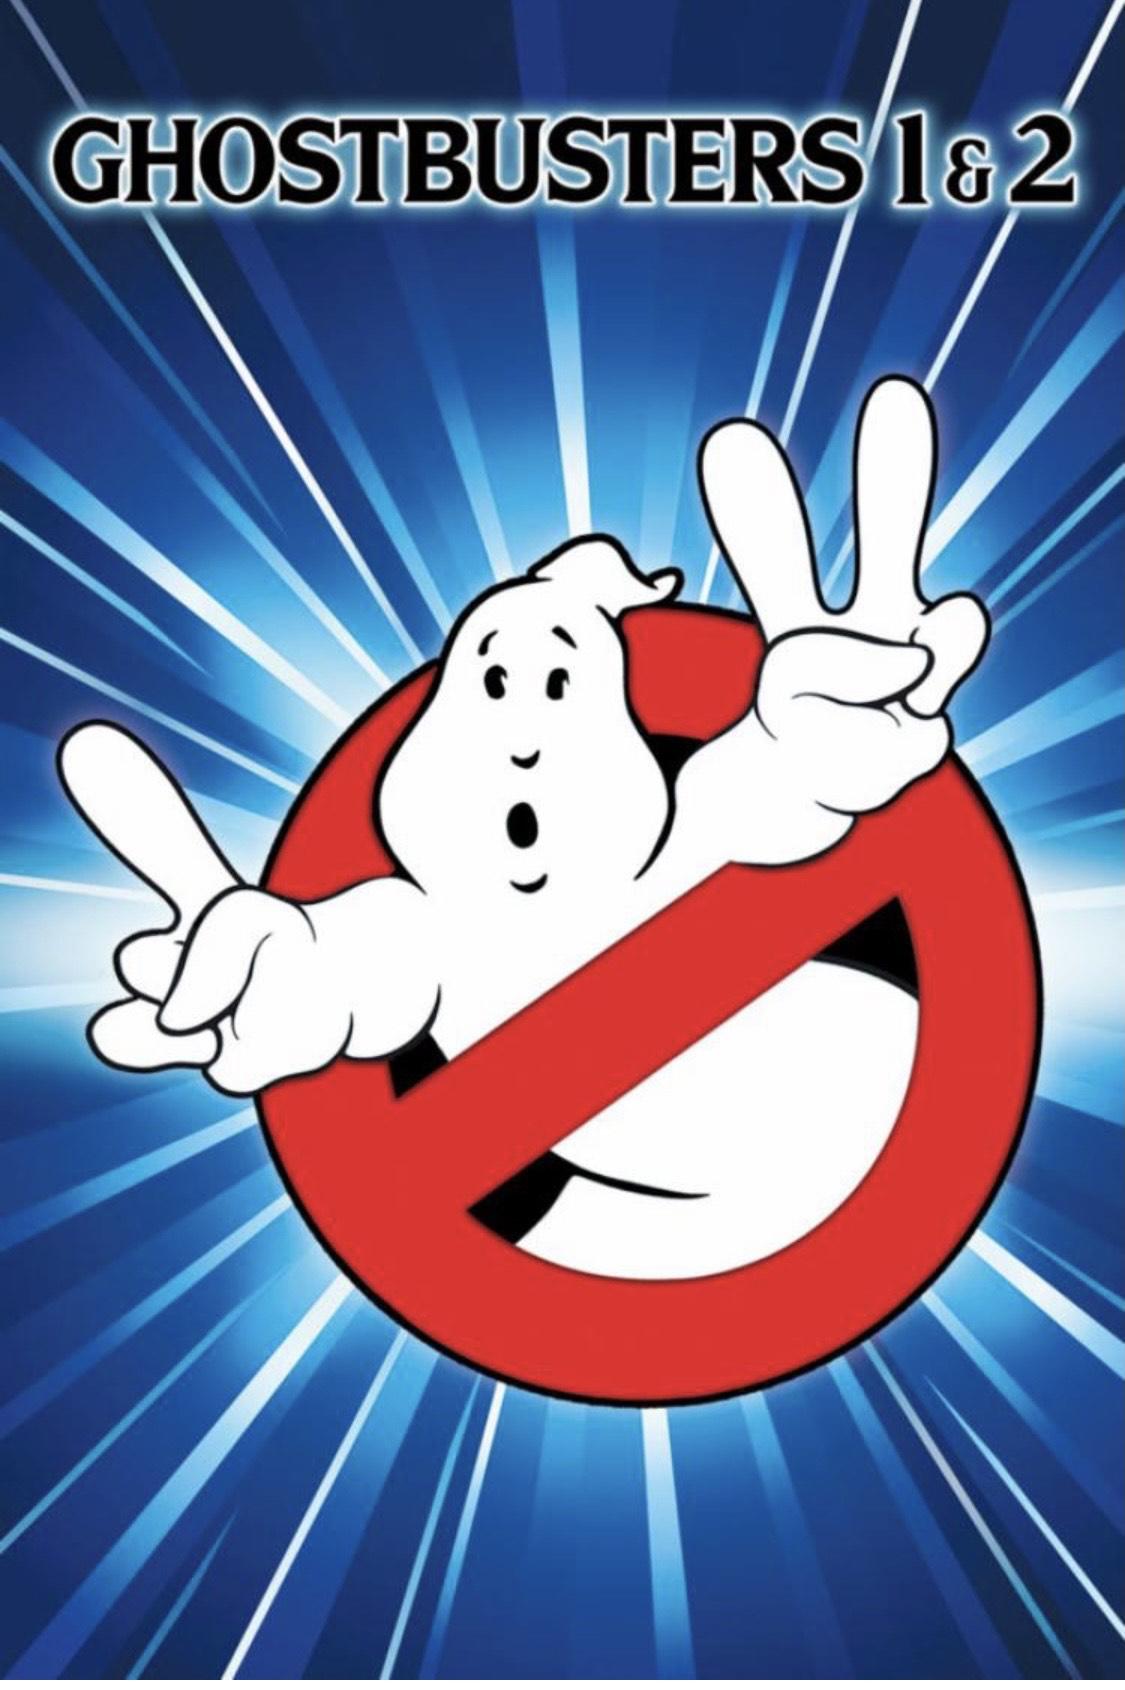 Ghostbusters 1 & 2 in 4K bei iTunes